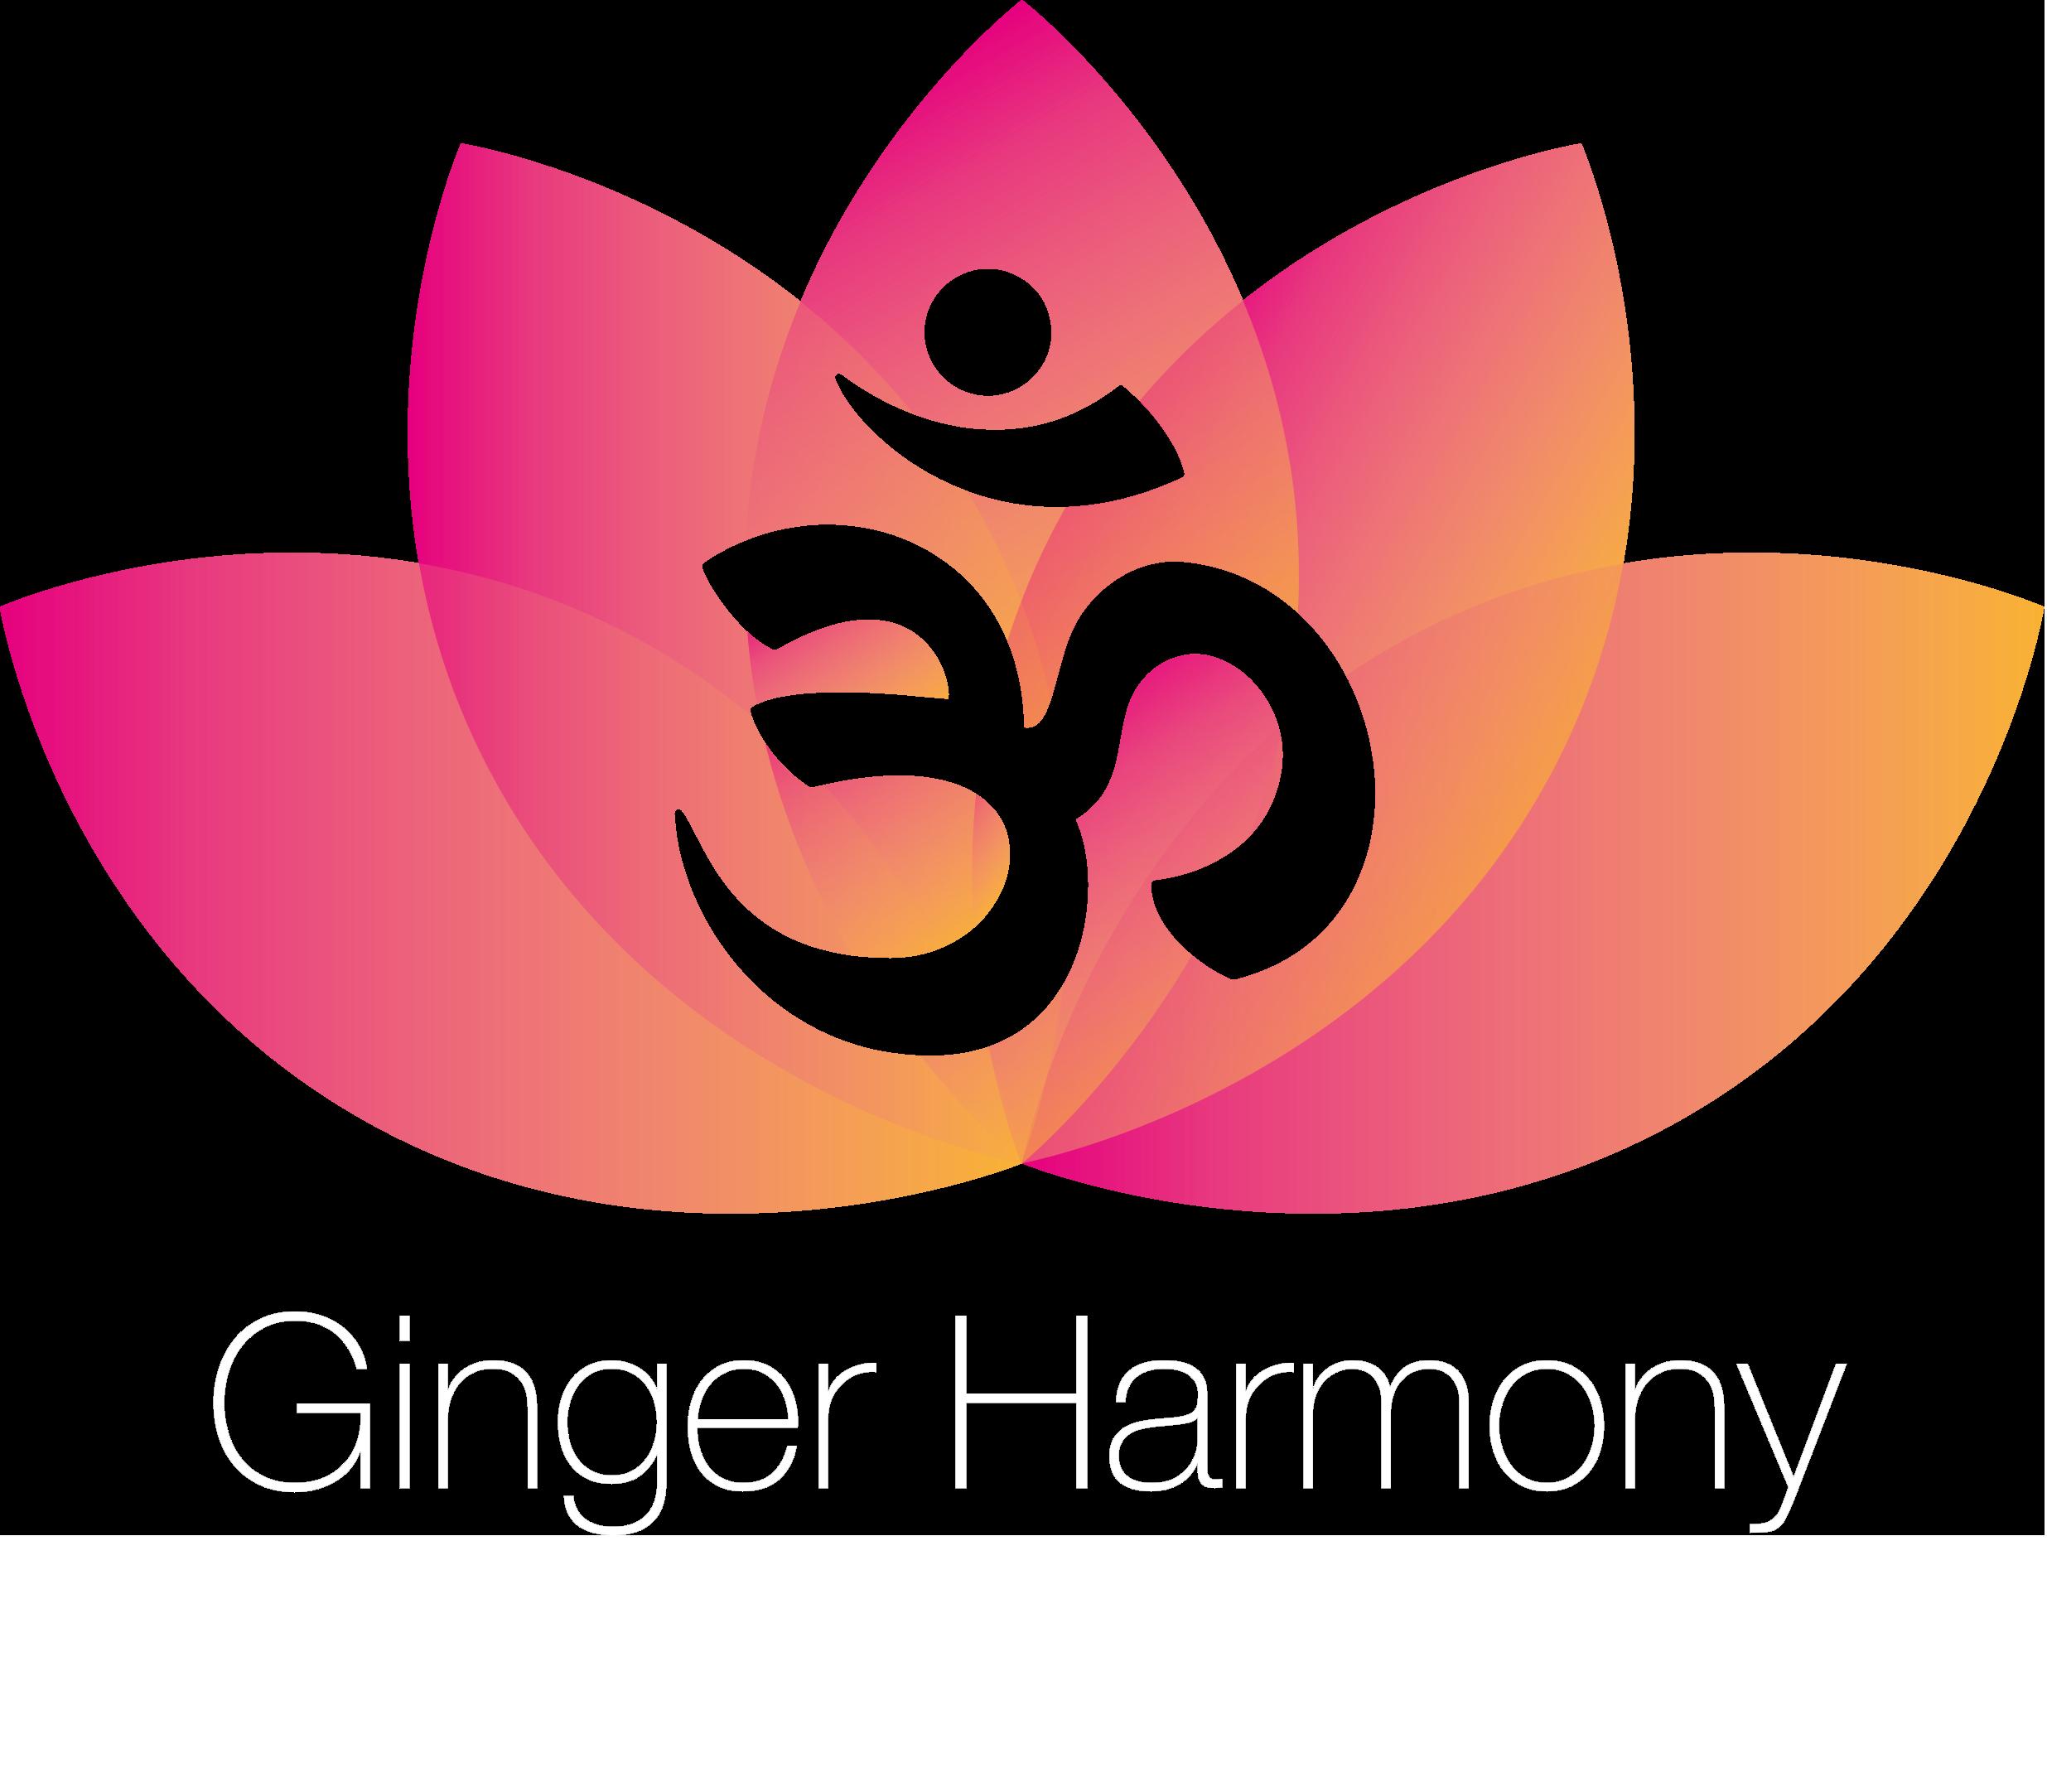 Ginger Harmony